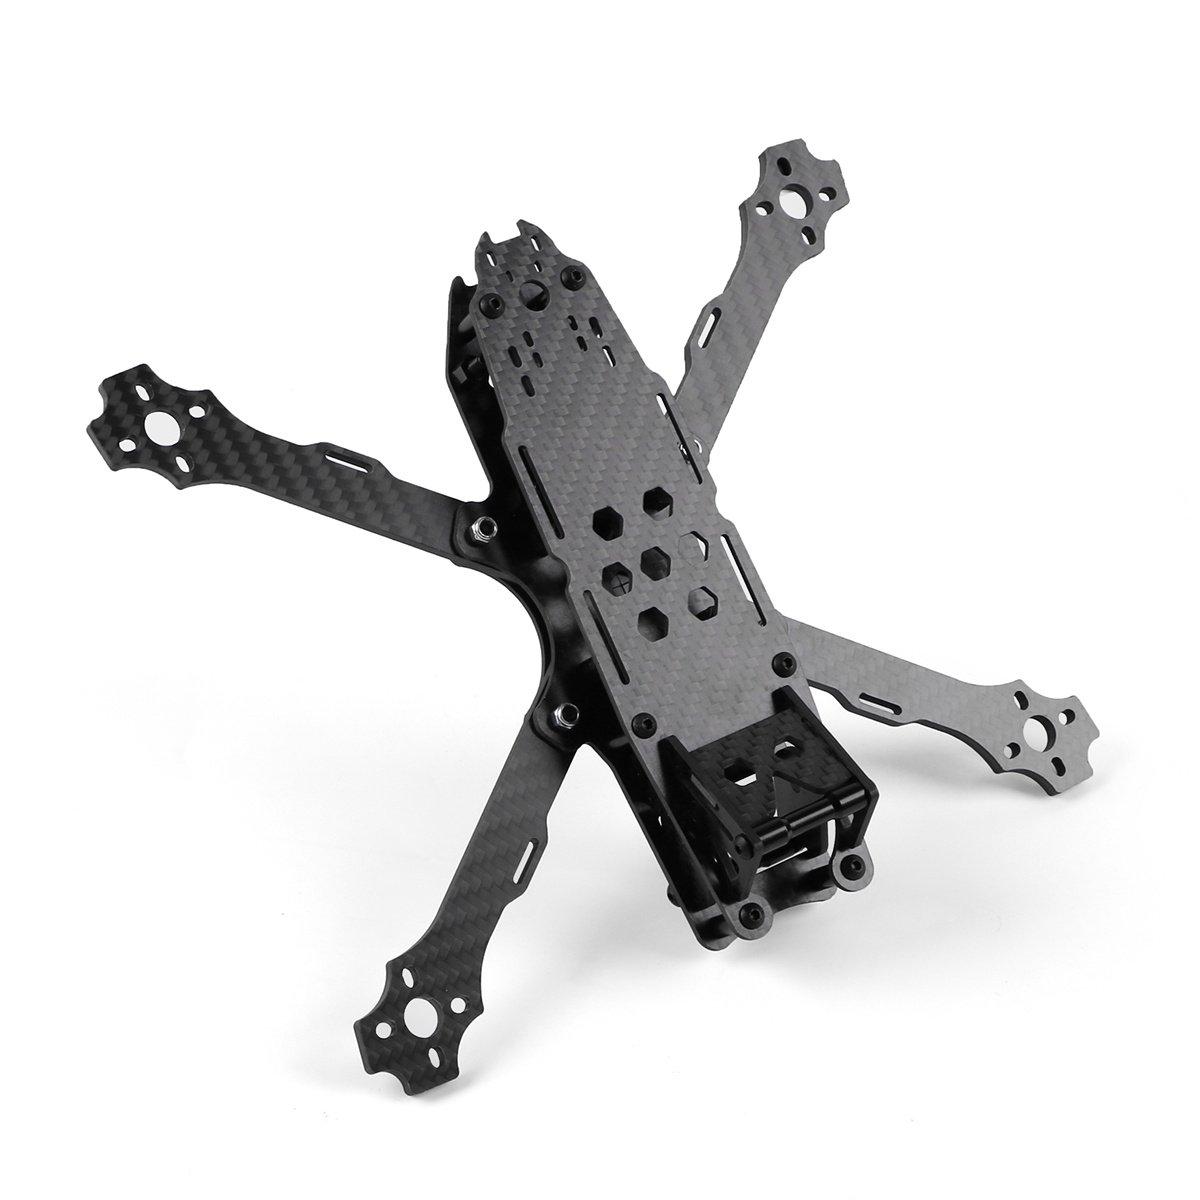 215mm FPV Racing Drone Frame para Fibra de Carbono Quadcopter Frame Kit con Correa de bater/ía